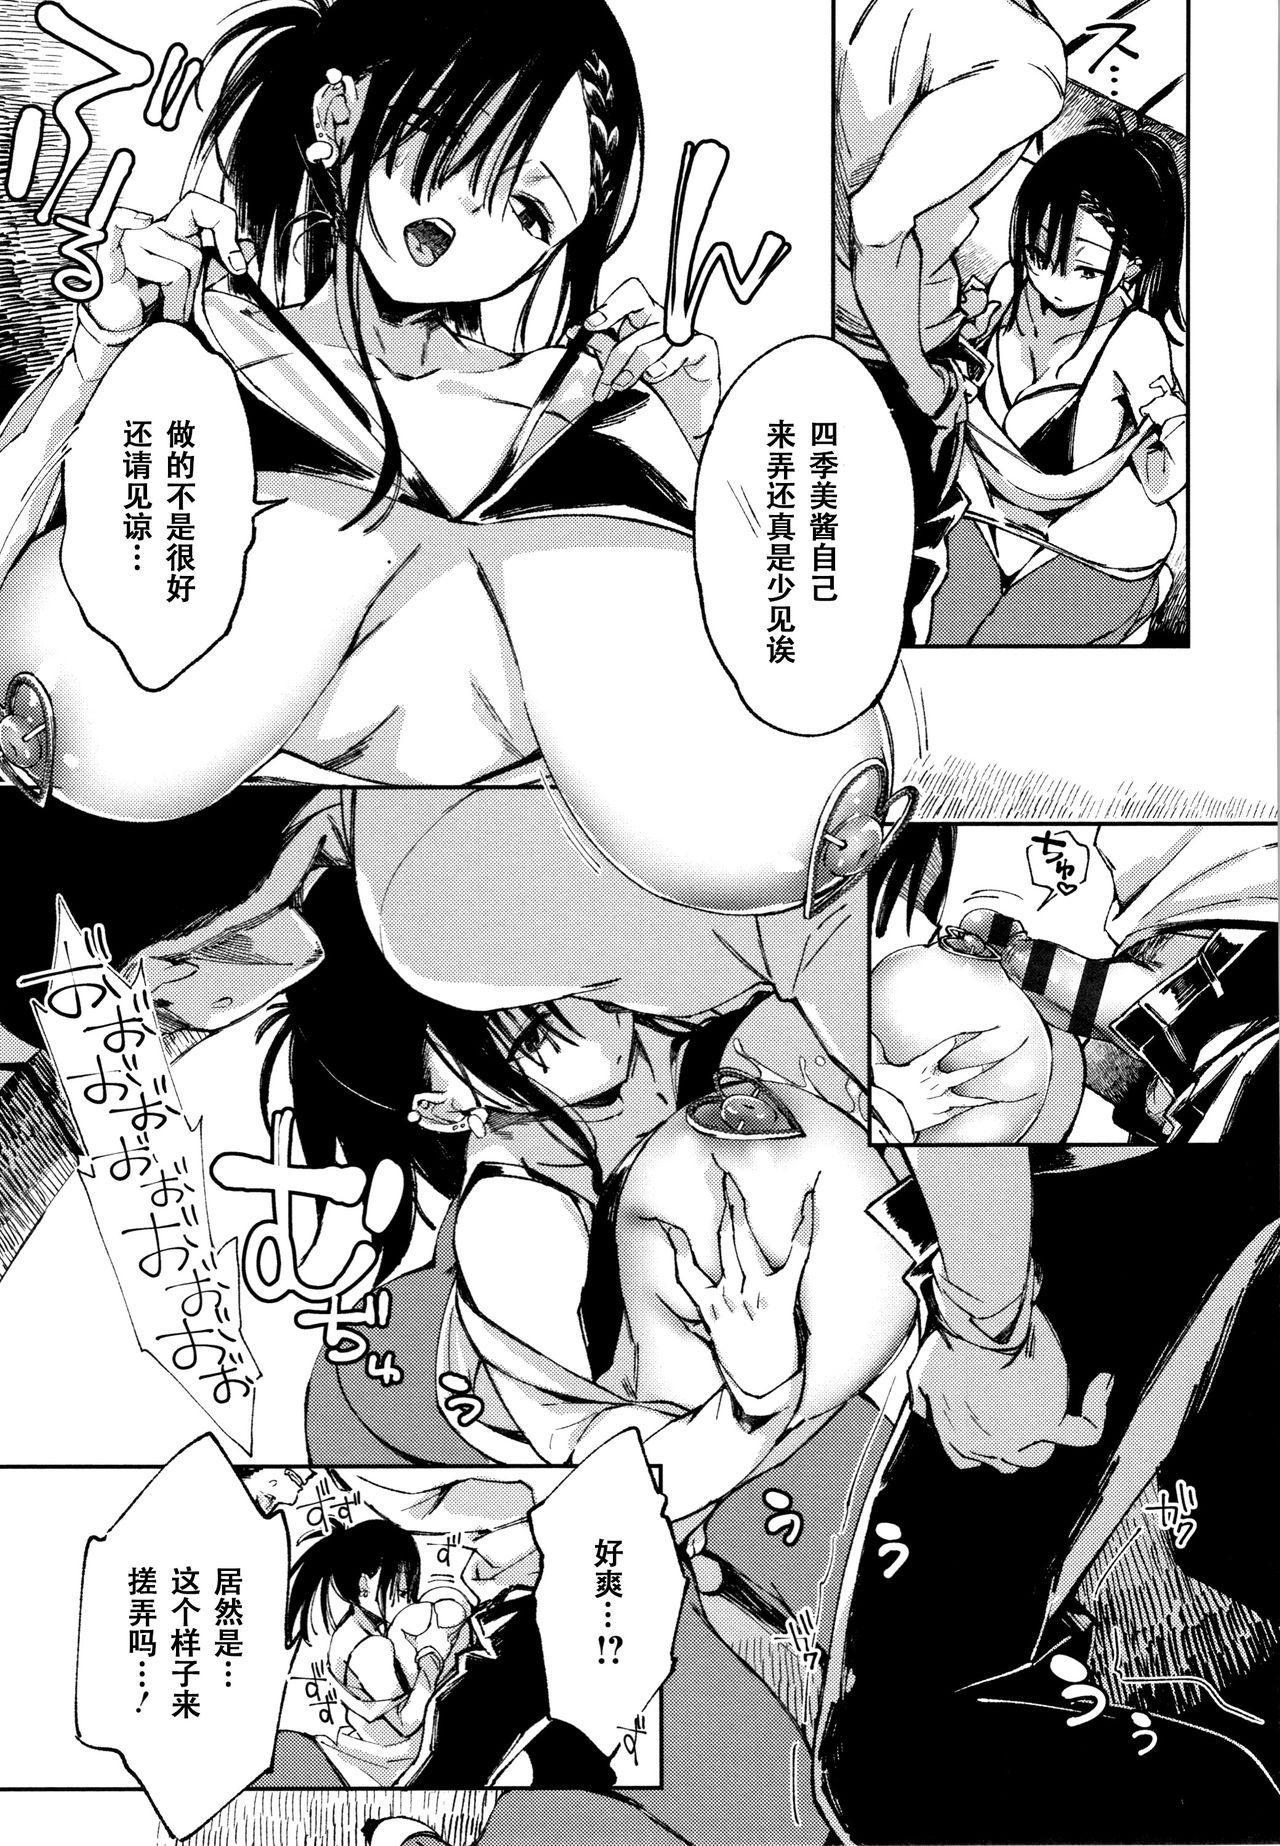 [Achumuchi] Saijaku Gal wa Ikizurai! - The weakest pussy is hard to go.ch.1-8 [Chinese] [战栗的玻璃棒汉化] [Ongoing] 179